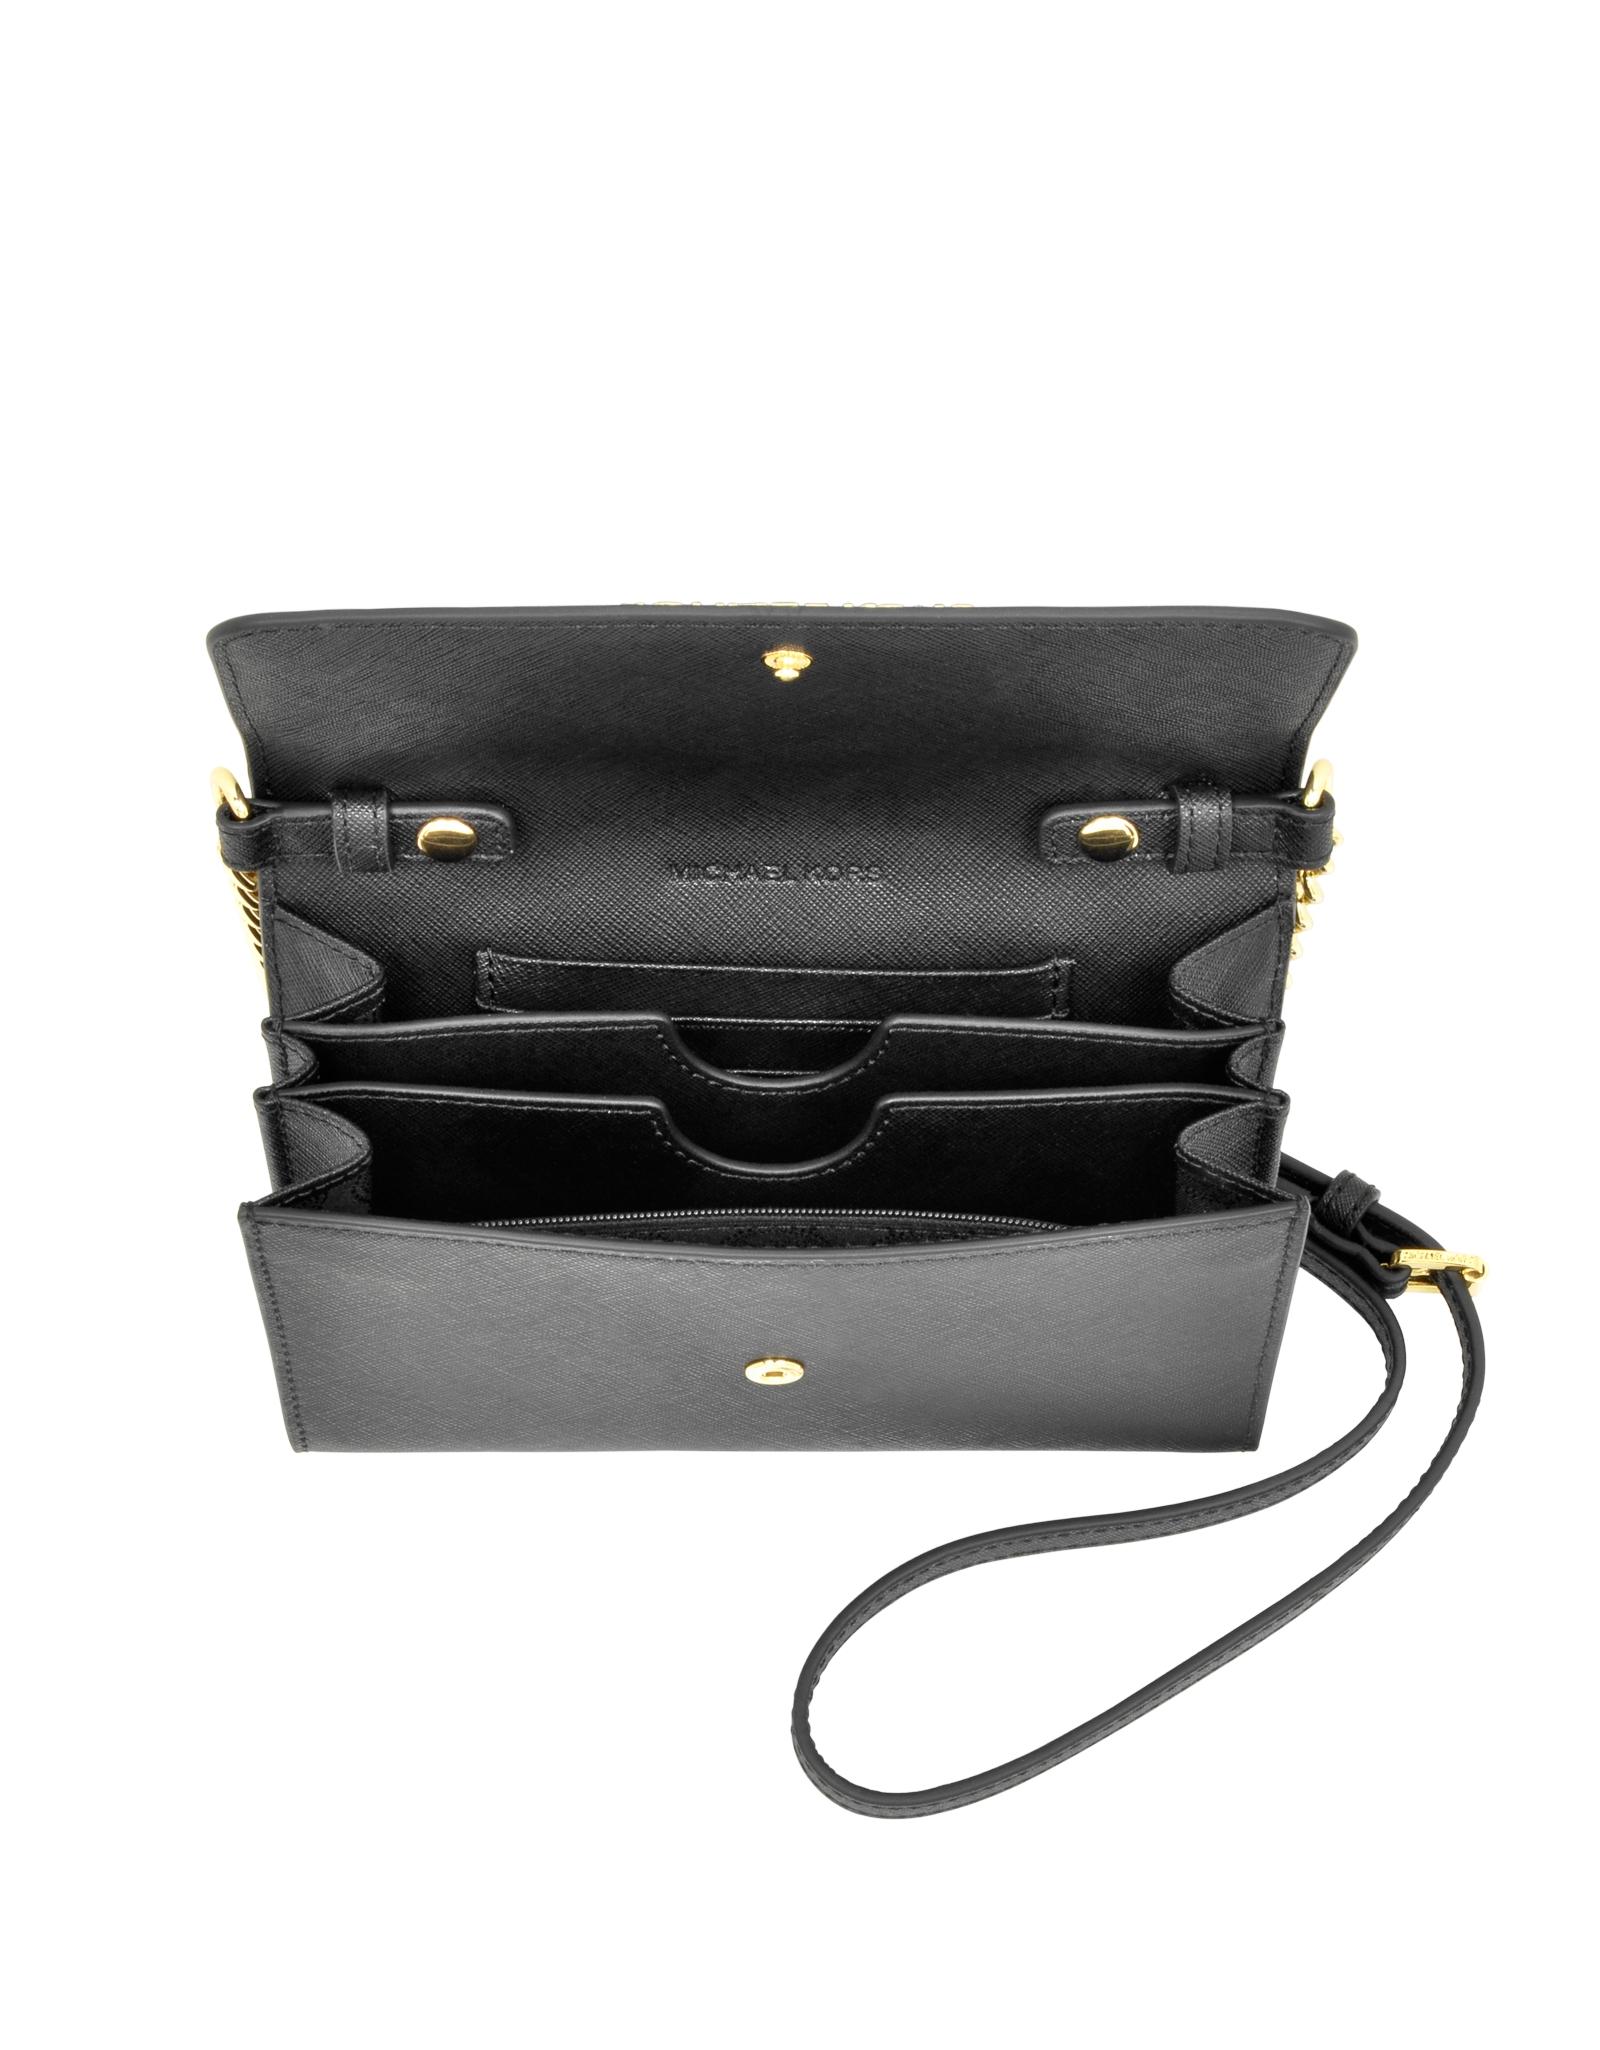 5ed8e8aa3cbe Lyst - Michael Kors Jet Set Travel Large Phone Crossbody in Black